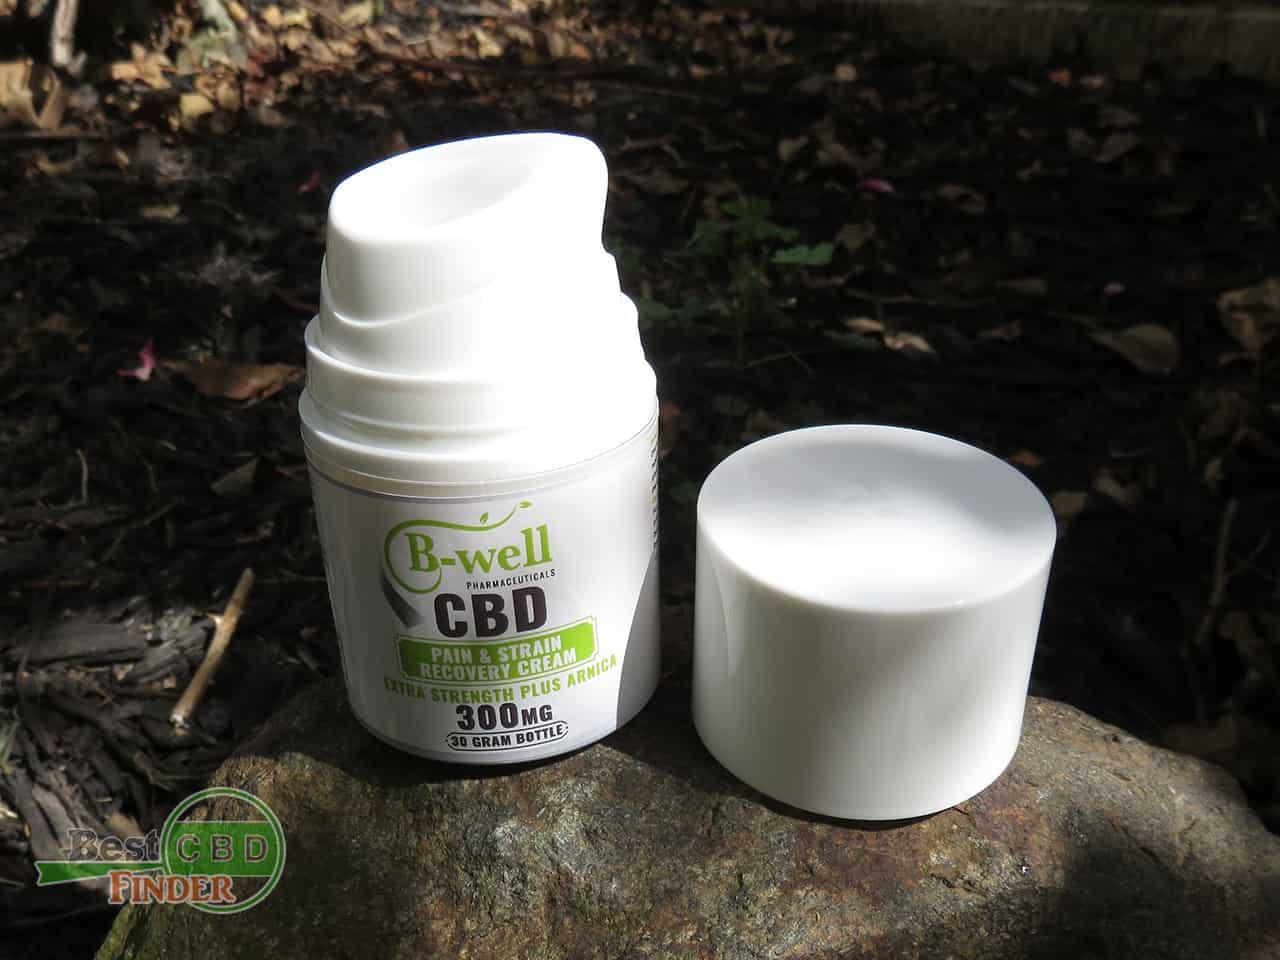 B-Well Pharmaceutical CBD Cream for Pains & Strains